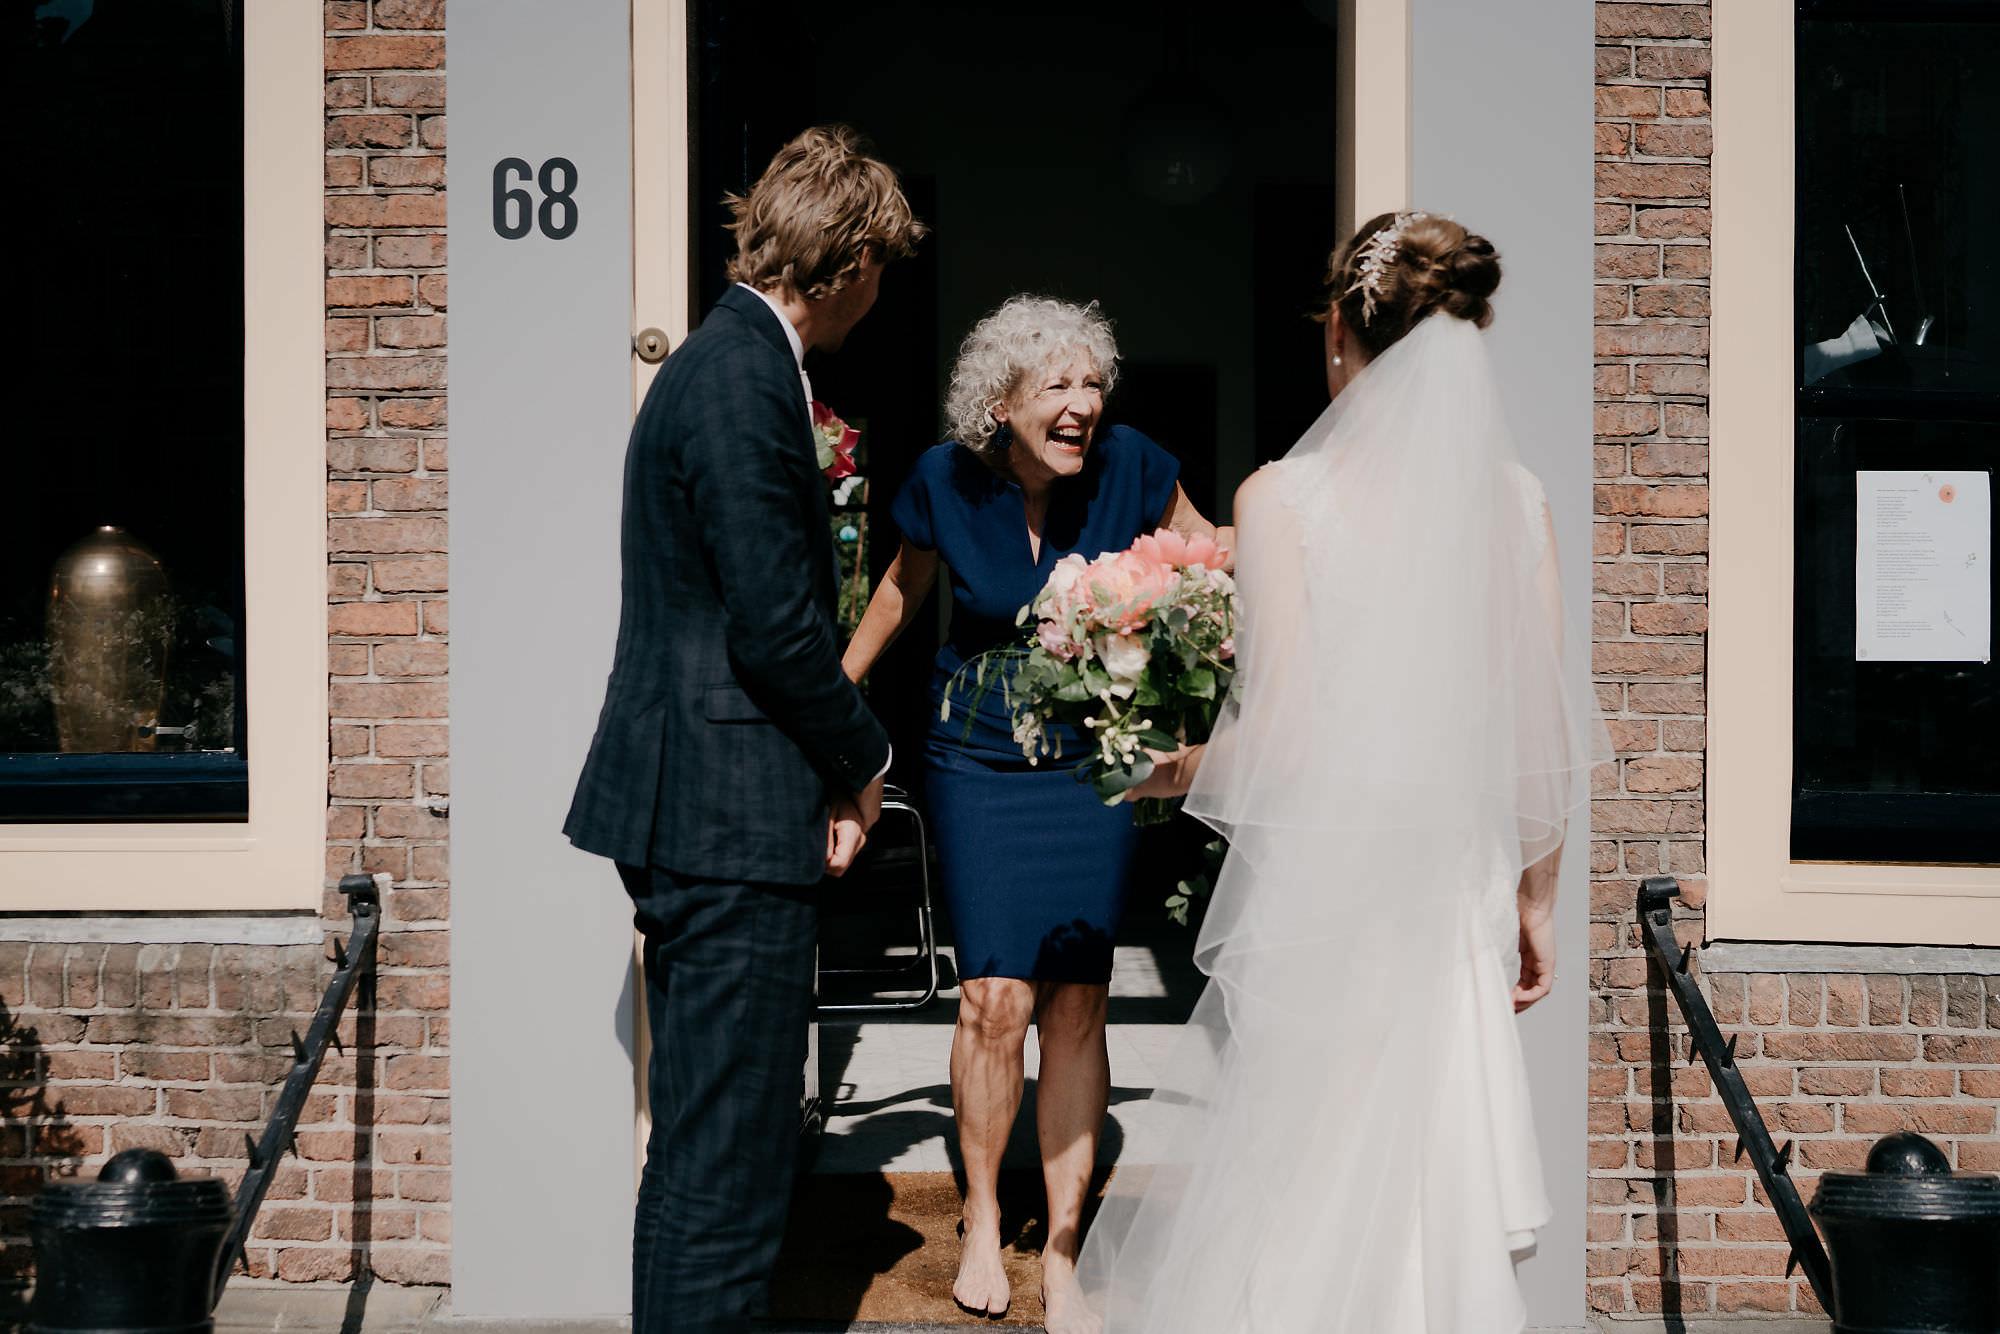 bruiloft fotograaf gezocht mark hadden photography